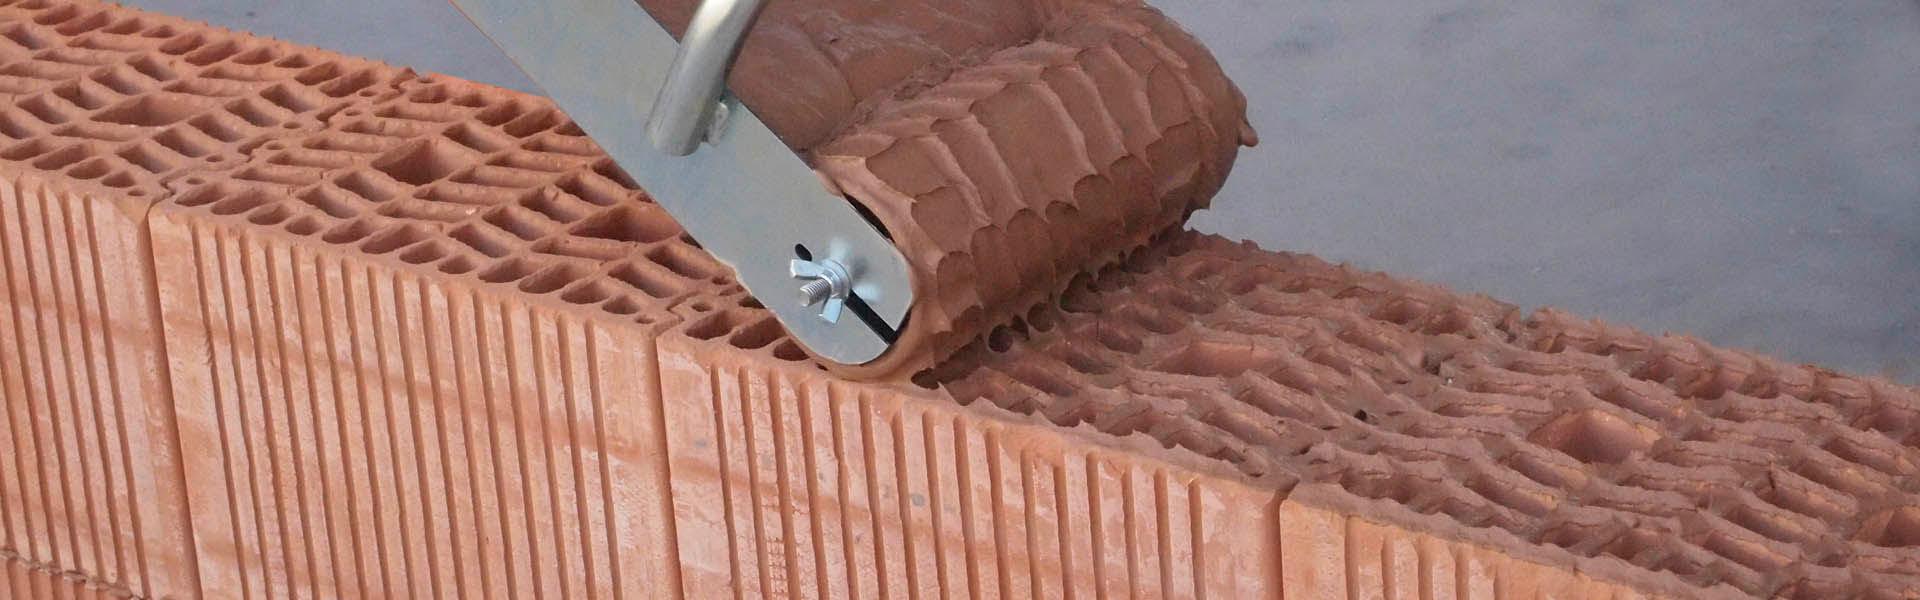 Cat logo de piezas termoarcilla ceramica sampedro - Ladrillo ceramico perforado ...